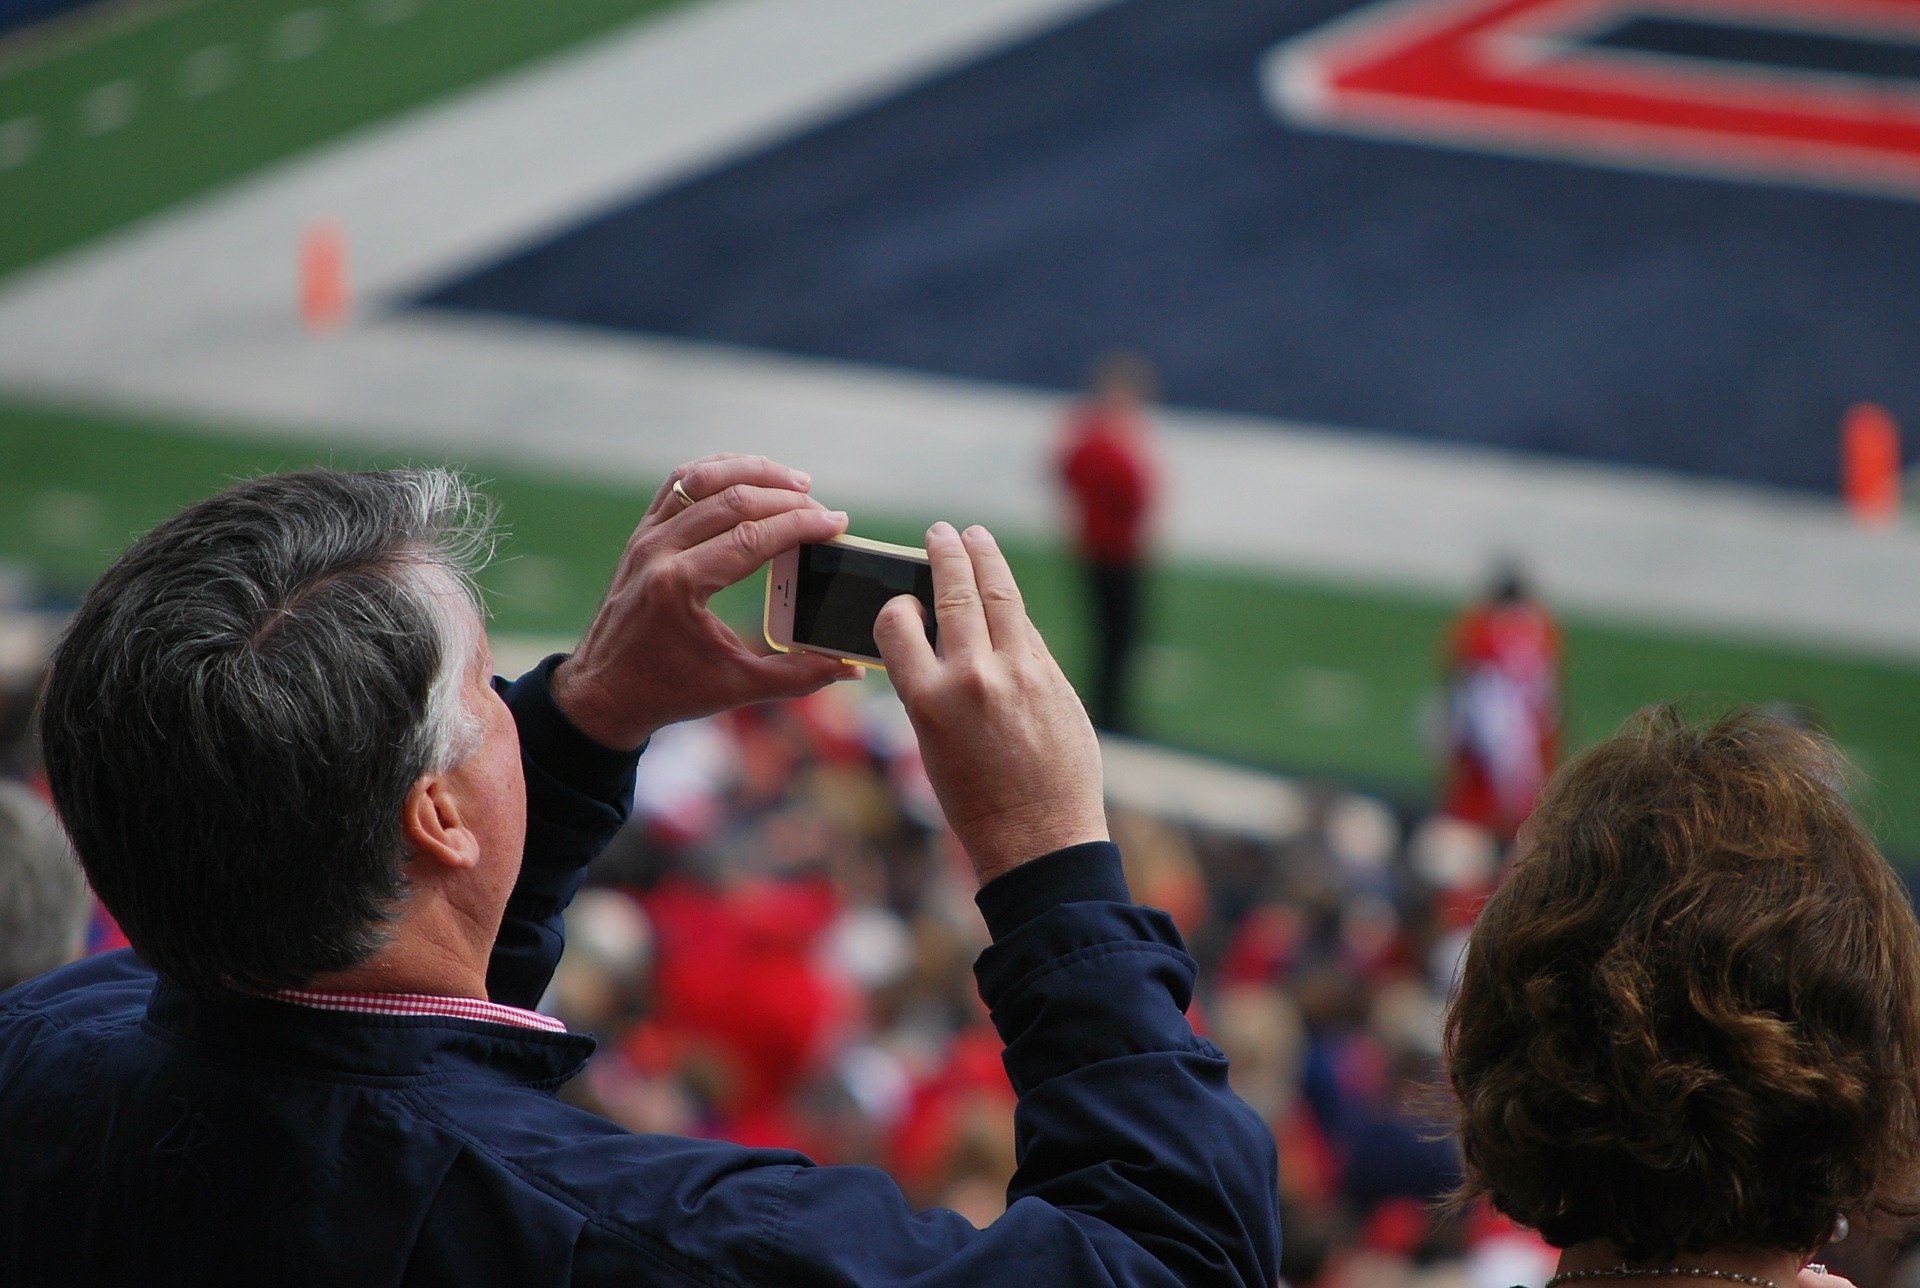 AGA predicts 45.2 million Americans will bet on football this season